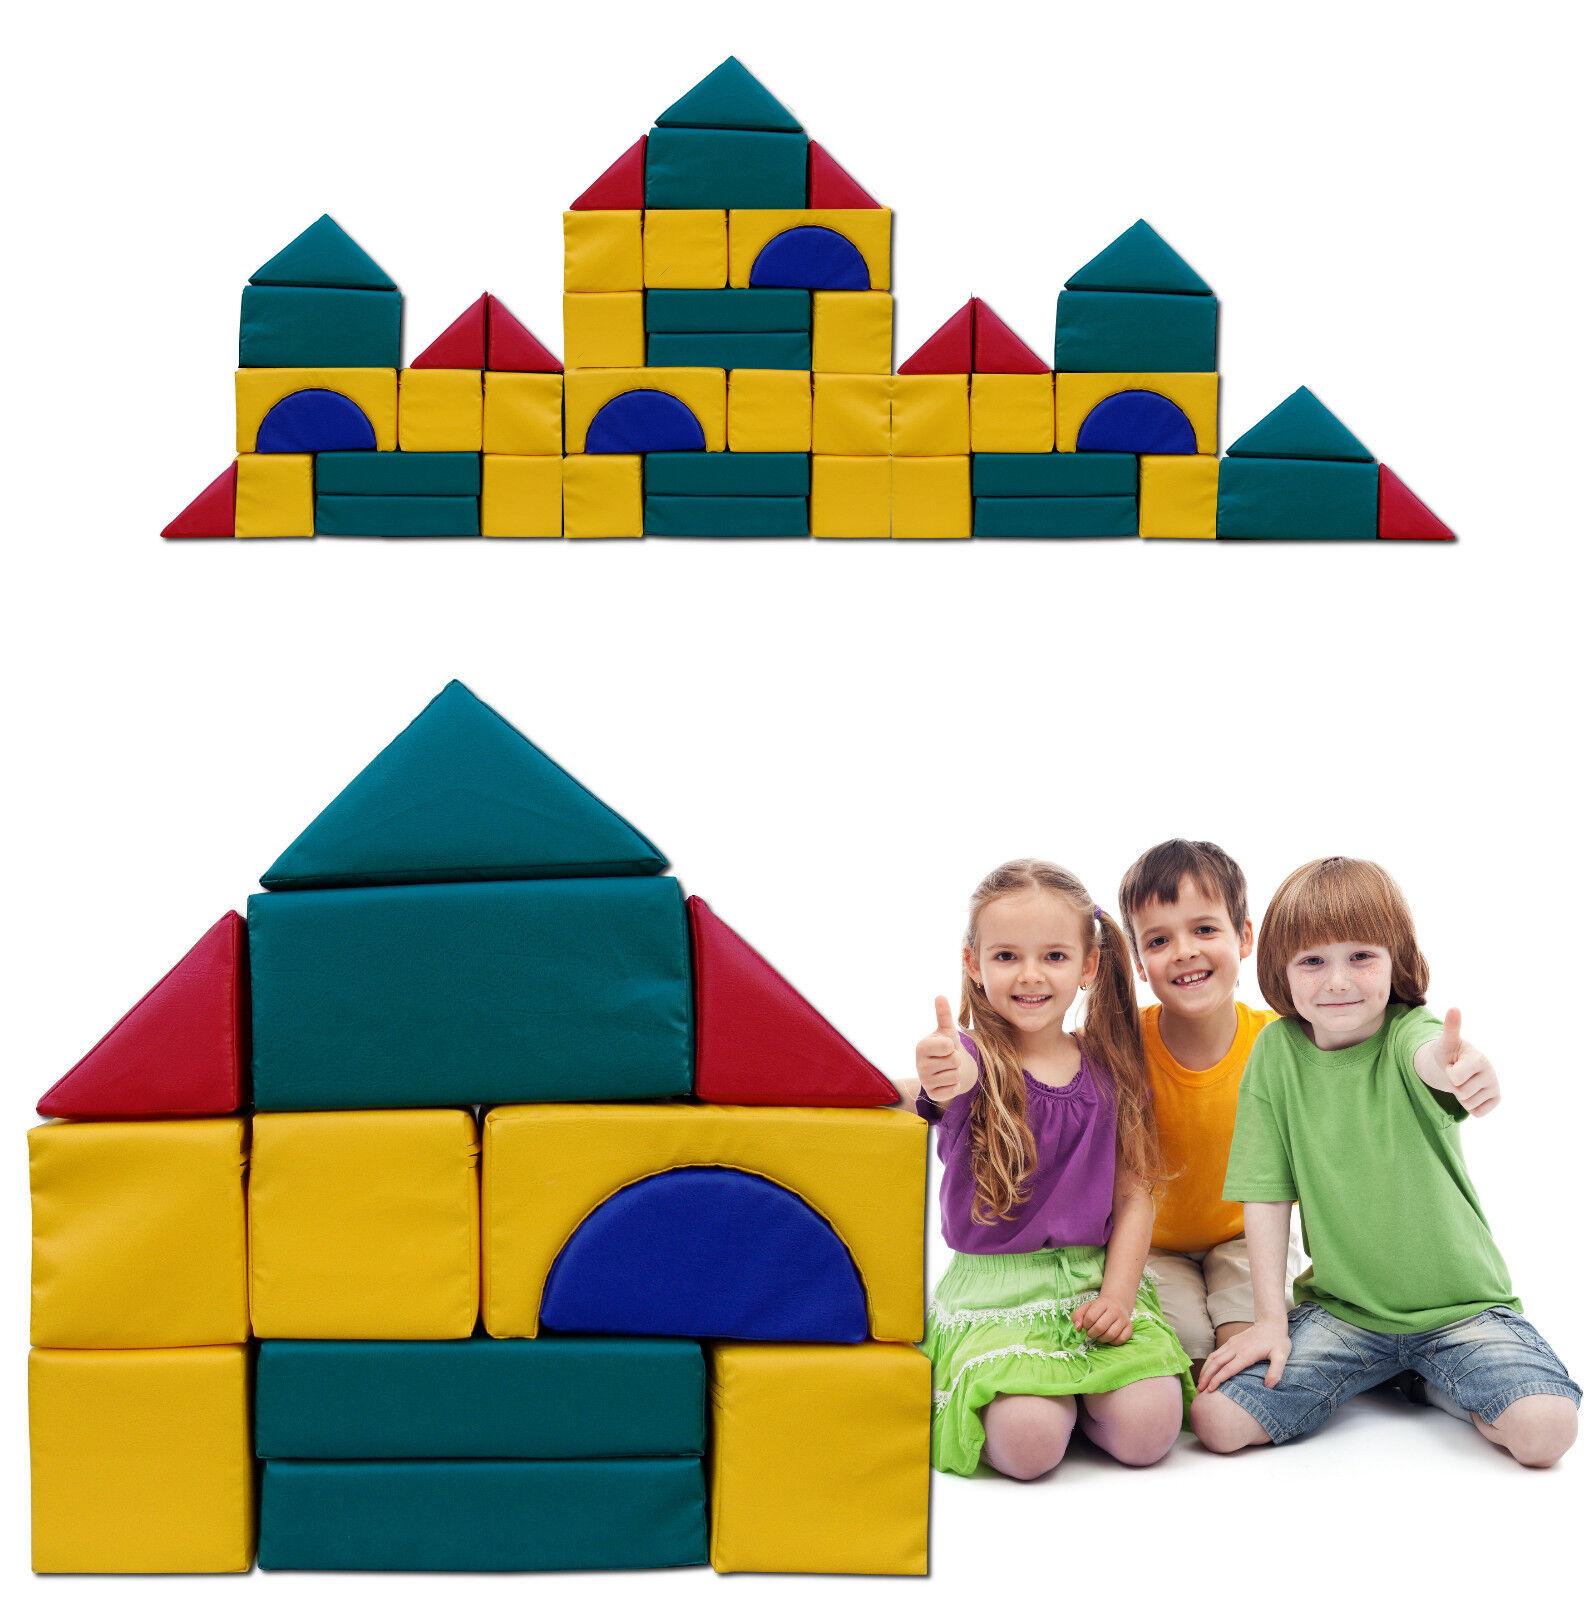 Großbausteine Kindergarten Kita Qualität Kunstleder-Bezug Reißverschluß Reißverschluß Reißverschluß 48 Teile 76e319